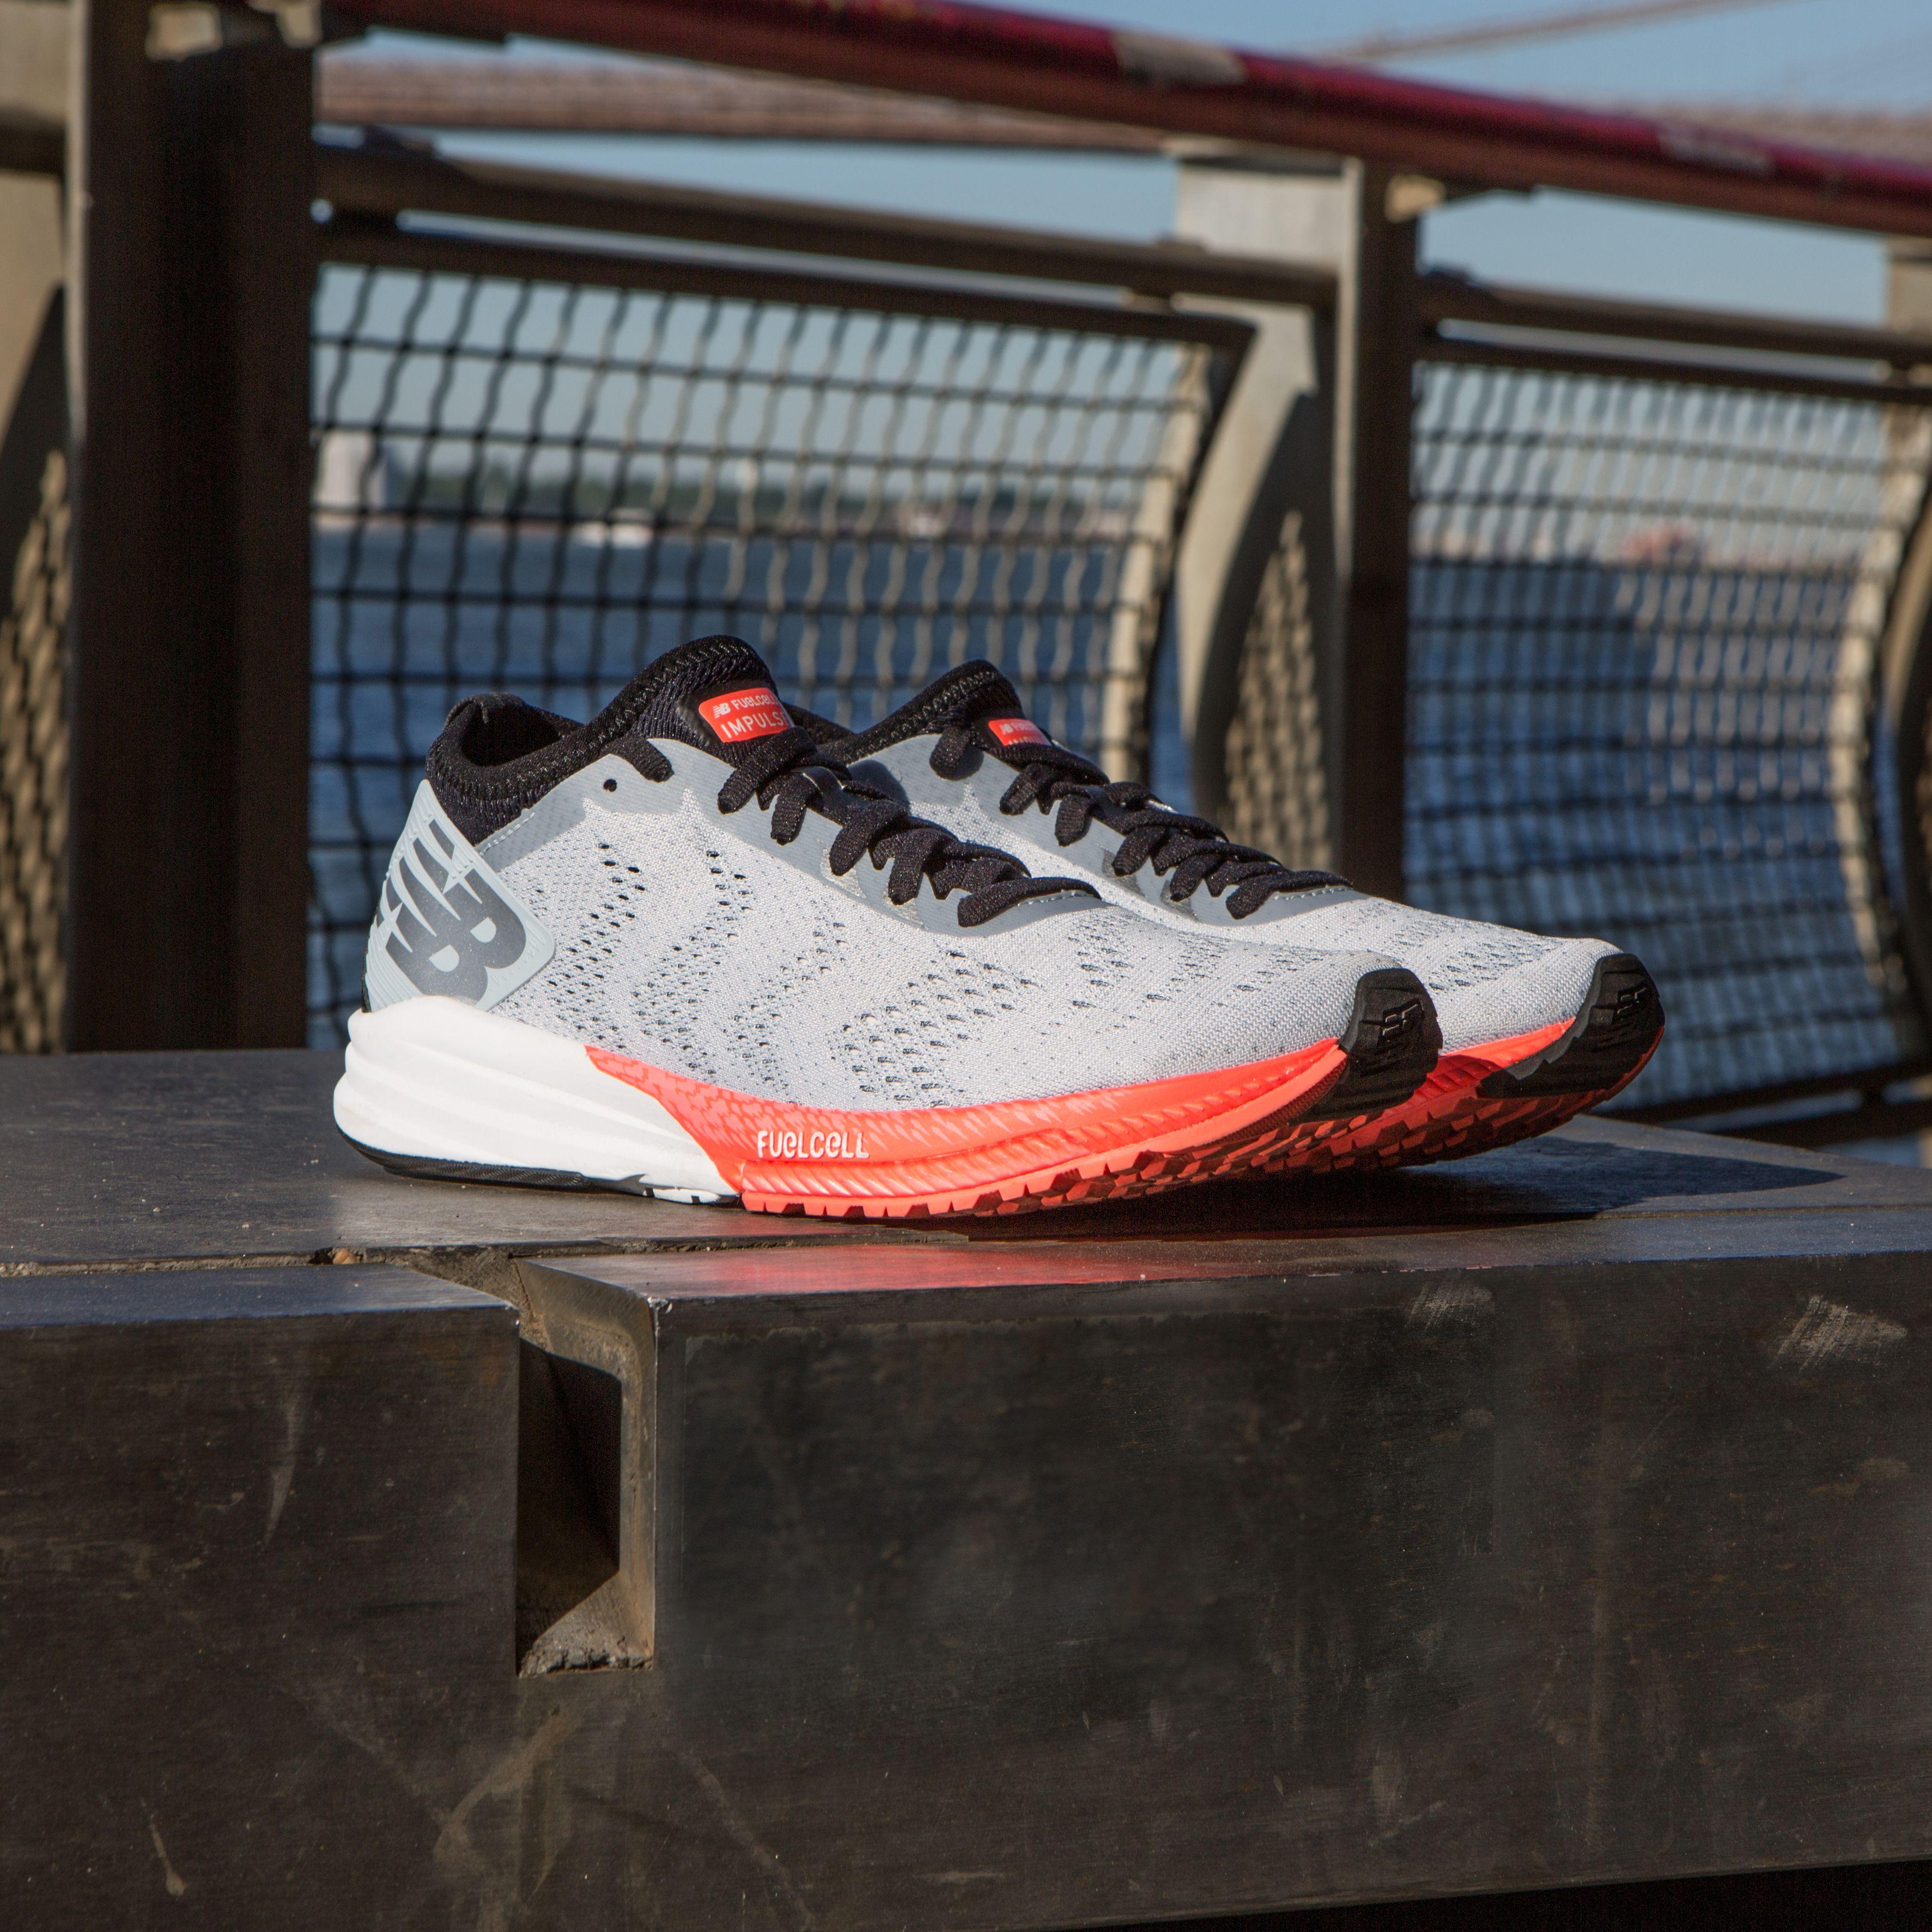 Nasz Impuls Do Dzialania Fuelcell Impulse Bieganie Sneakers Fashion New Balance Running Inspiration